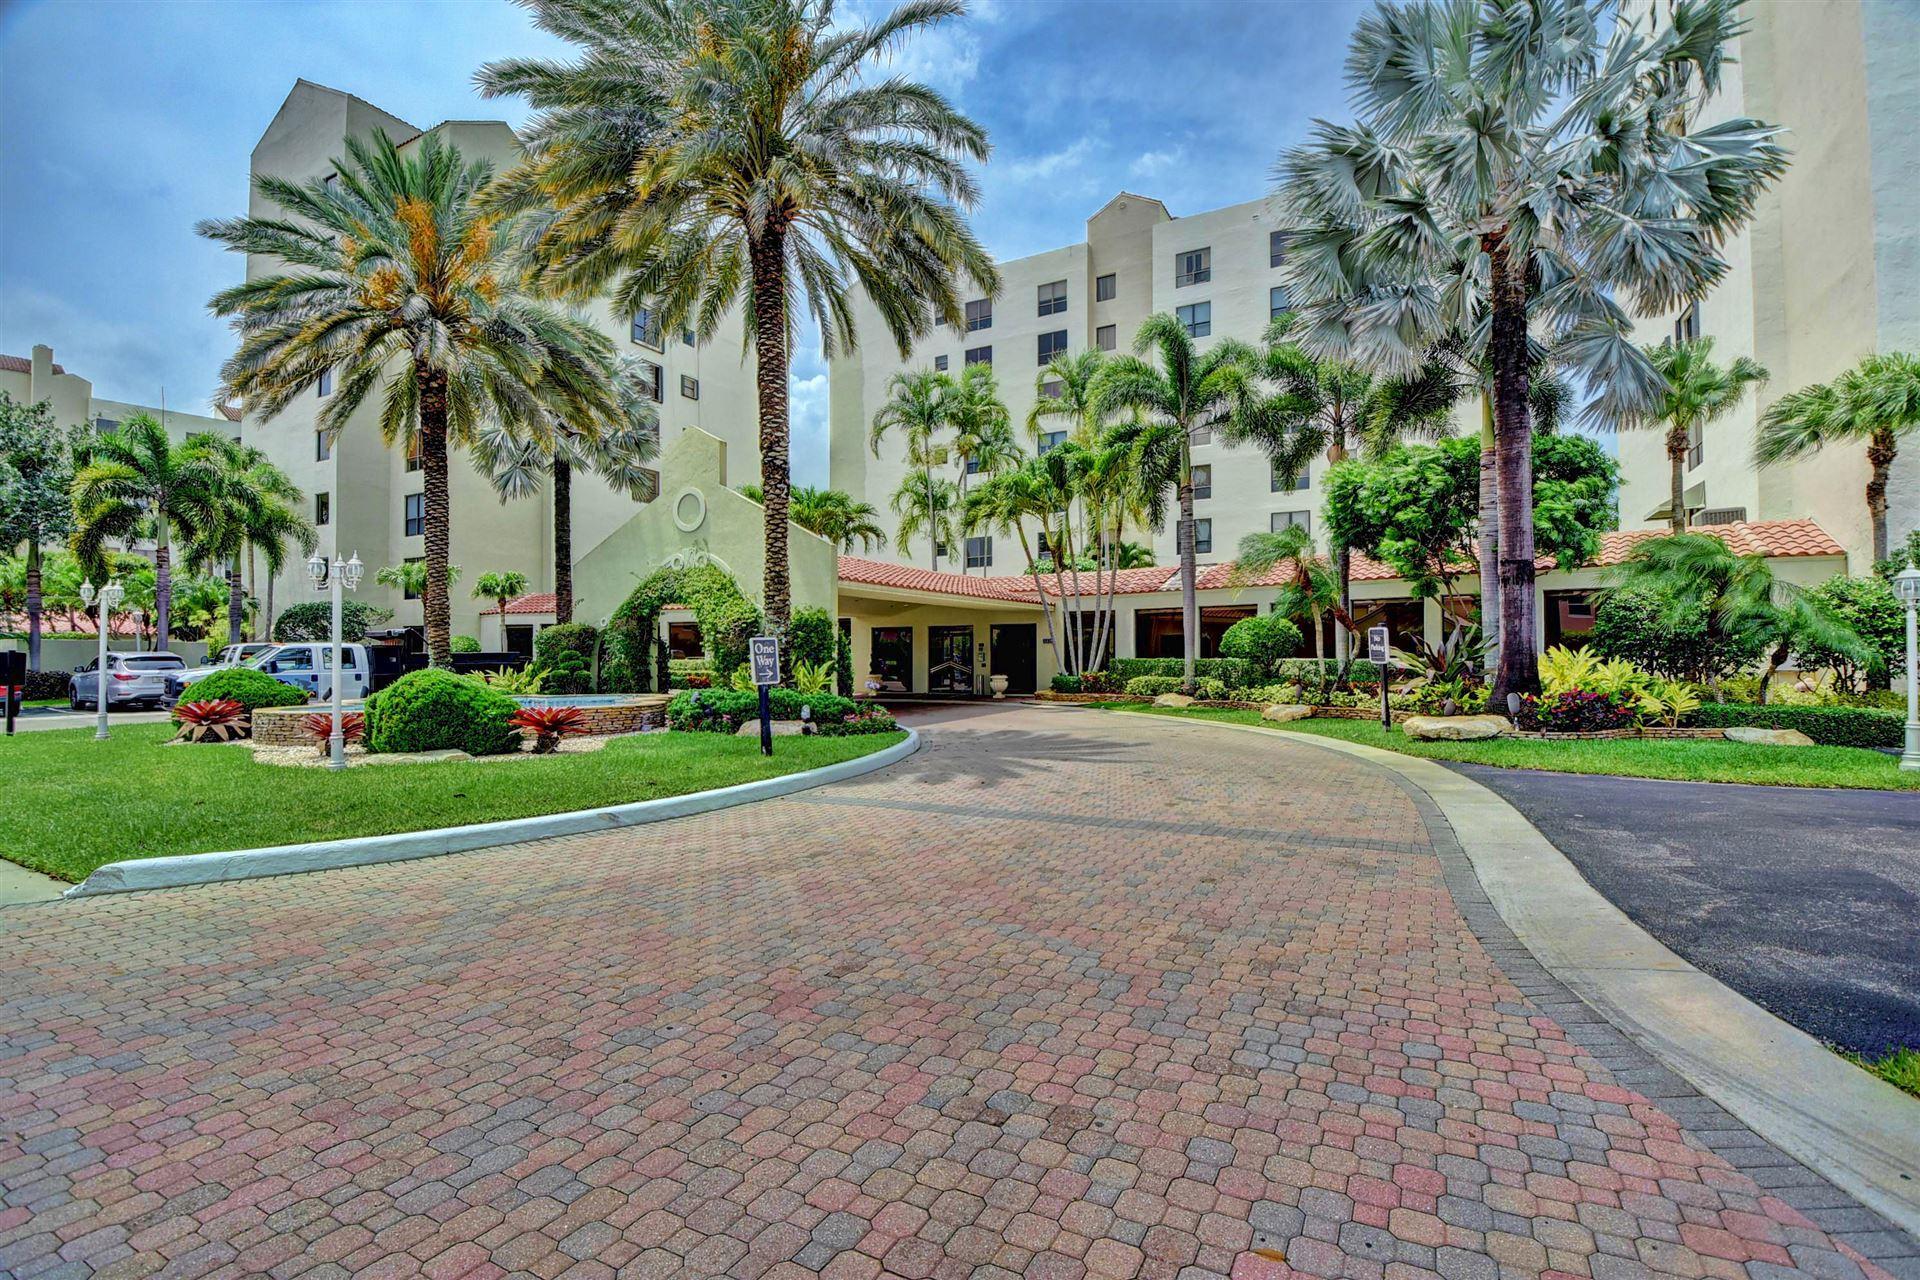 7235 Promenade Drive #J-301, Boca Raton, FL 33433 - #: RX-10627830